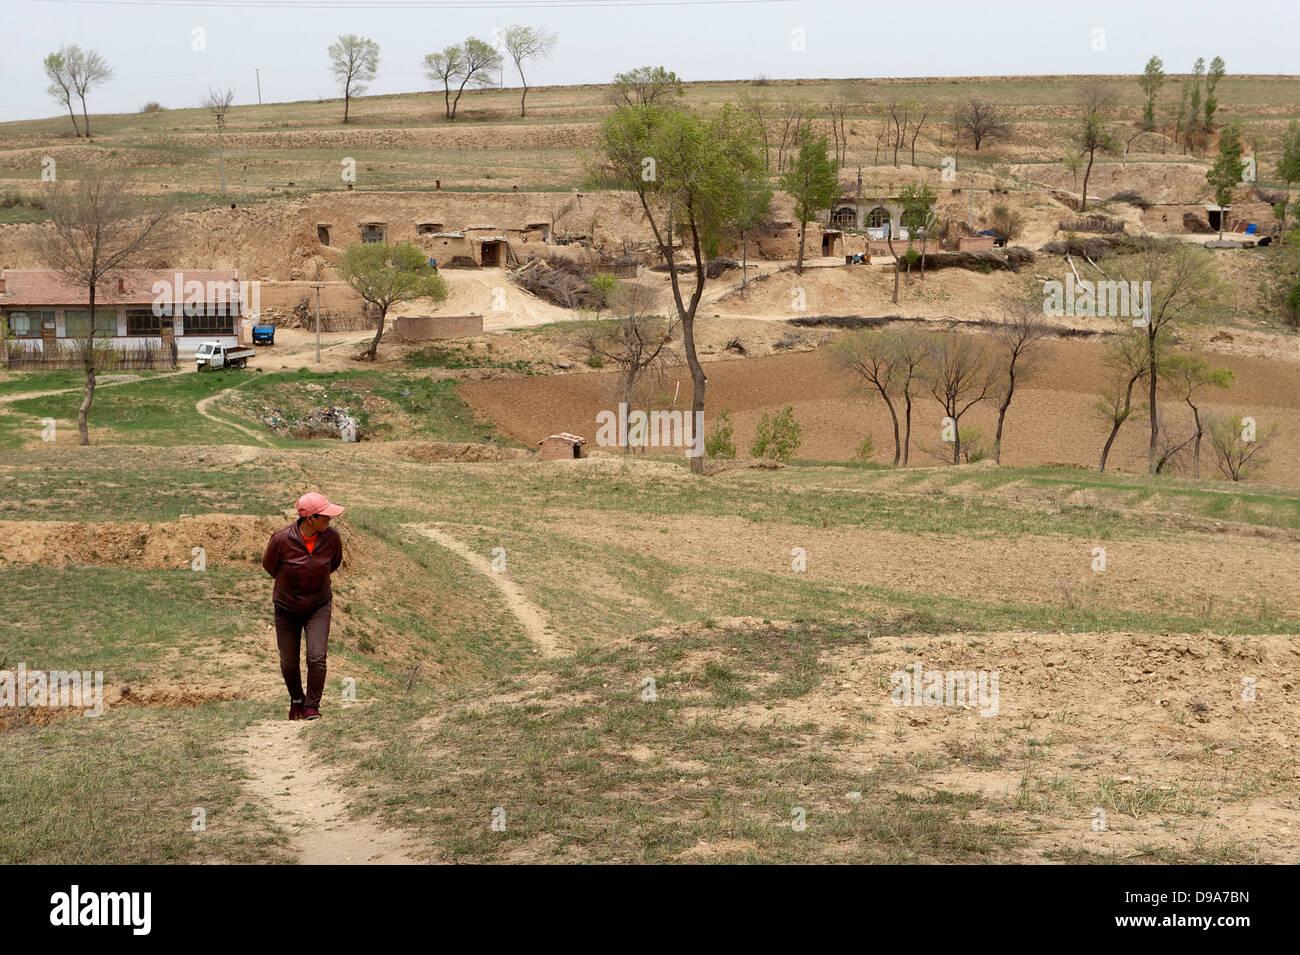 Eine Höhle Wohnung Dorf in Qingshuihe County in der Inneren Mongolei im China.11 Mai 2011 Stockbild